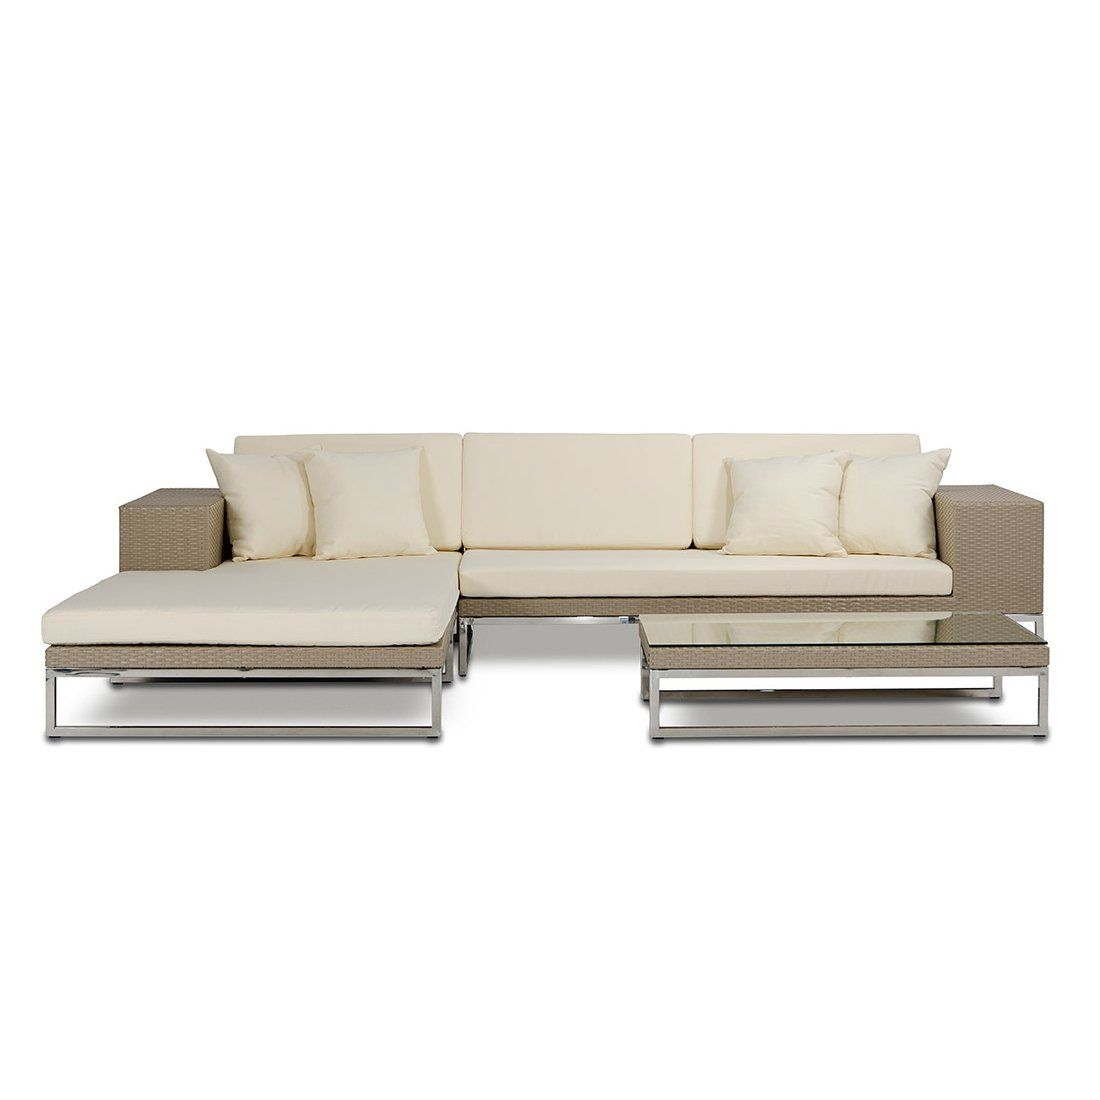 Vig Furniture VGRM7256 Limba Patio Sectional Sofa Set